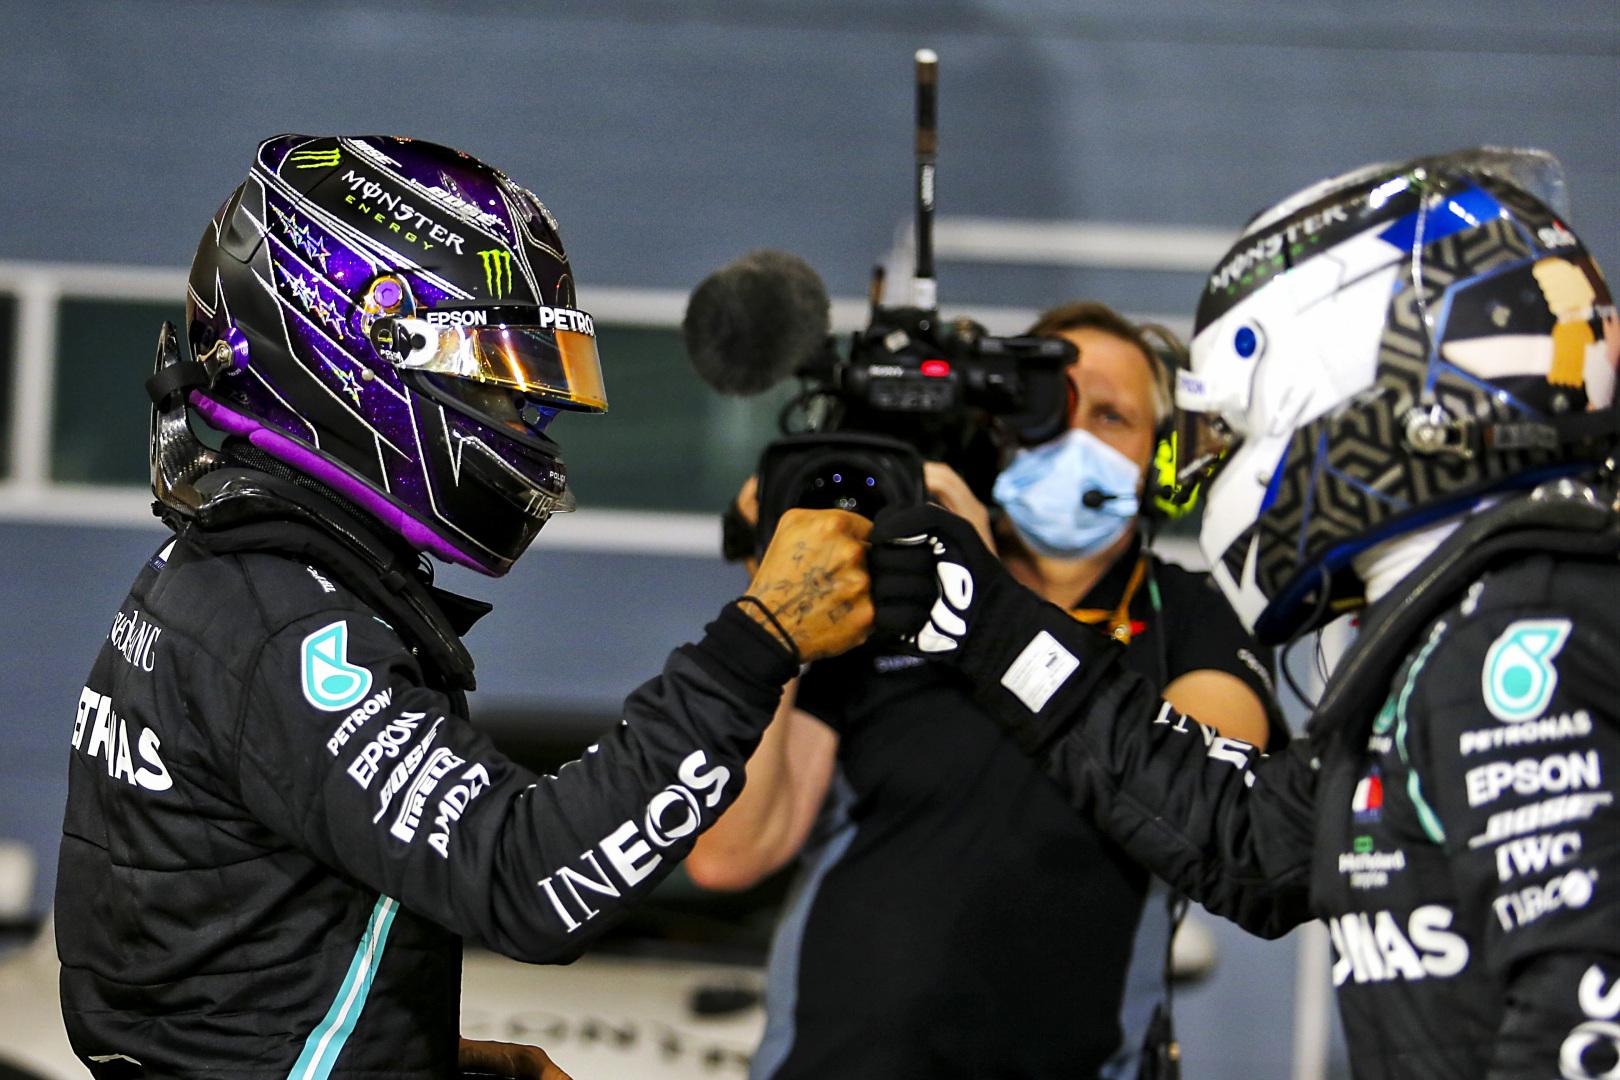 J. Trulli: L. Hamiltonas ir M. Schumacheris niekada neturėjo stipraus komandos draugo